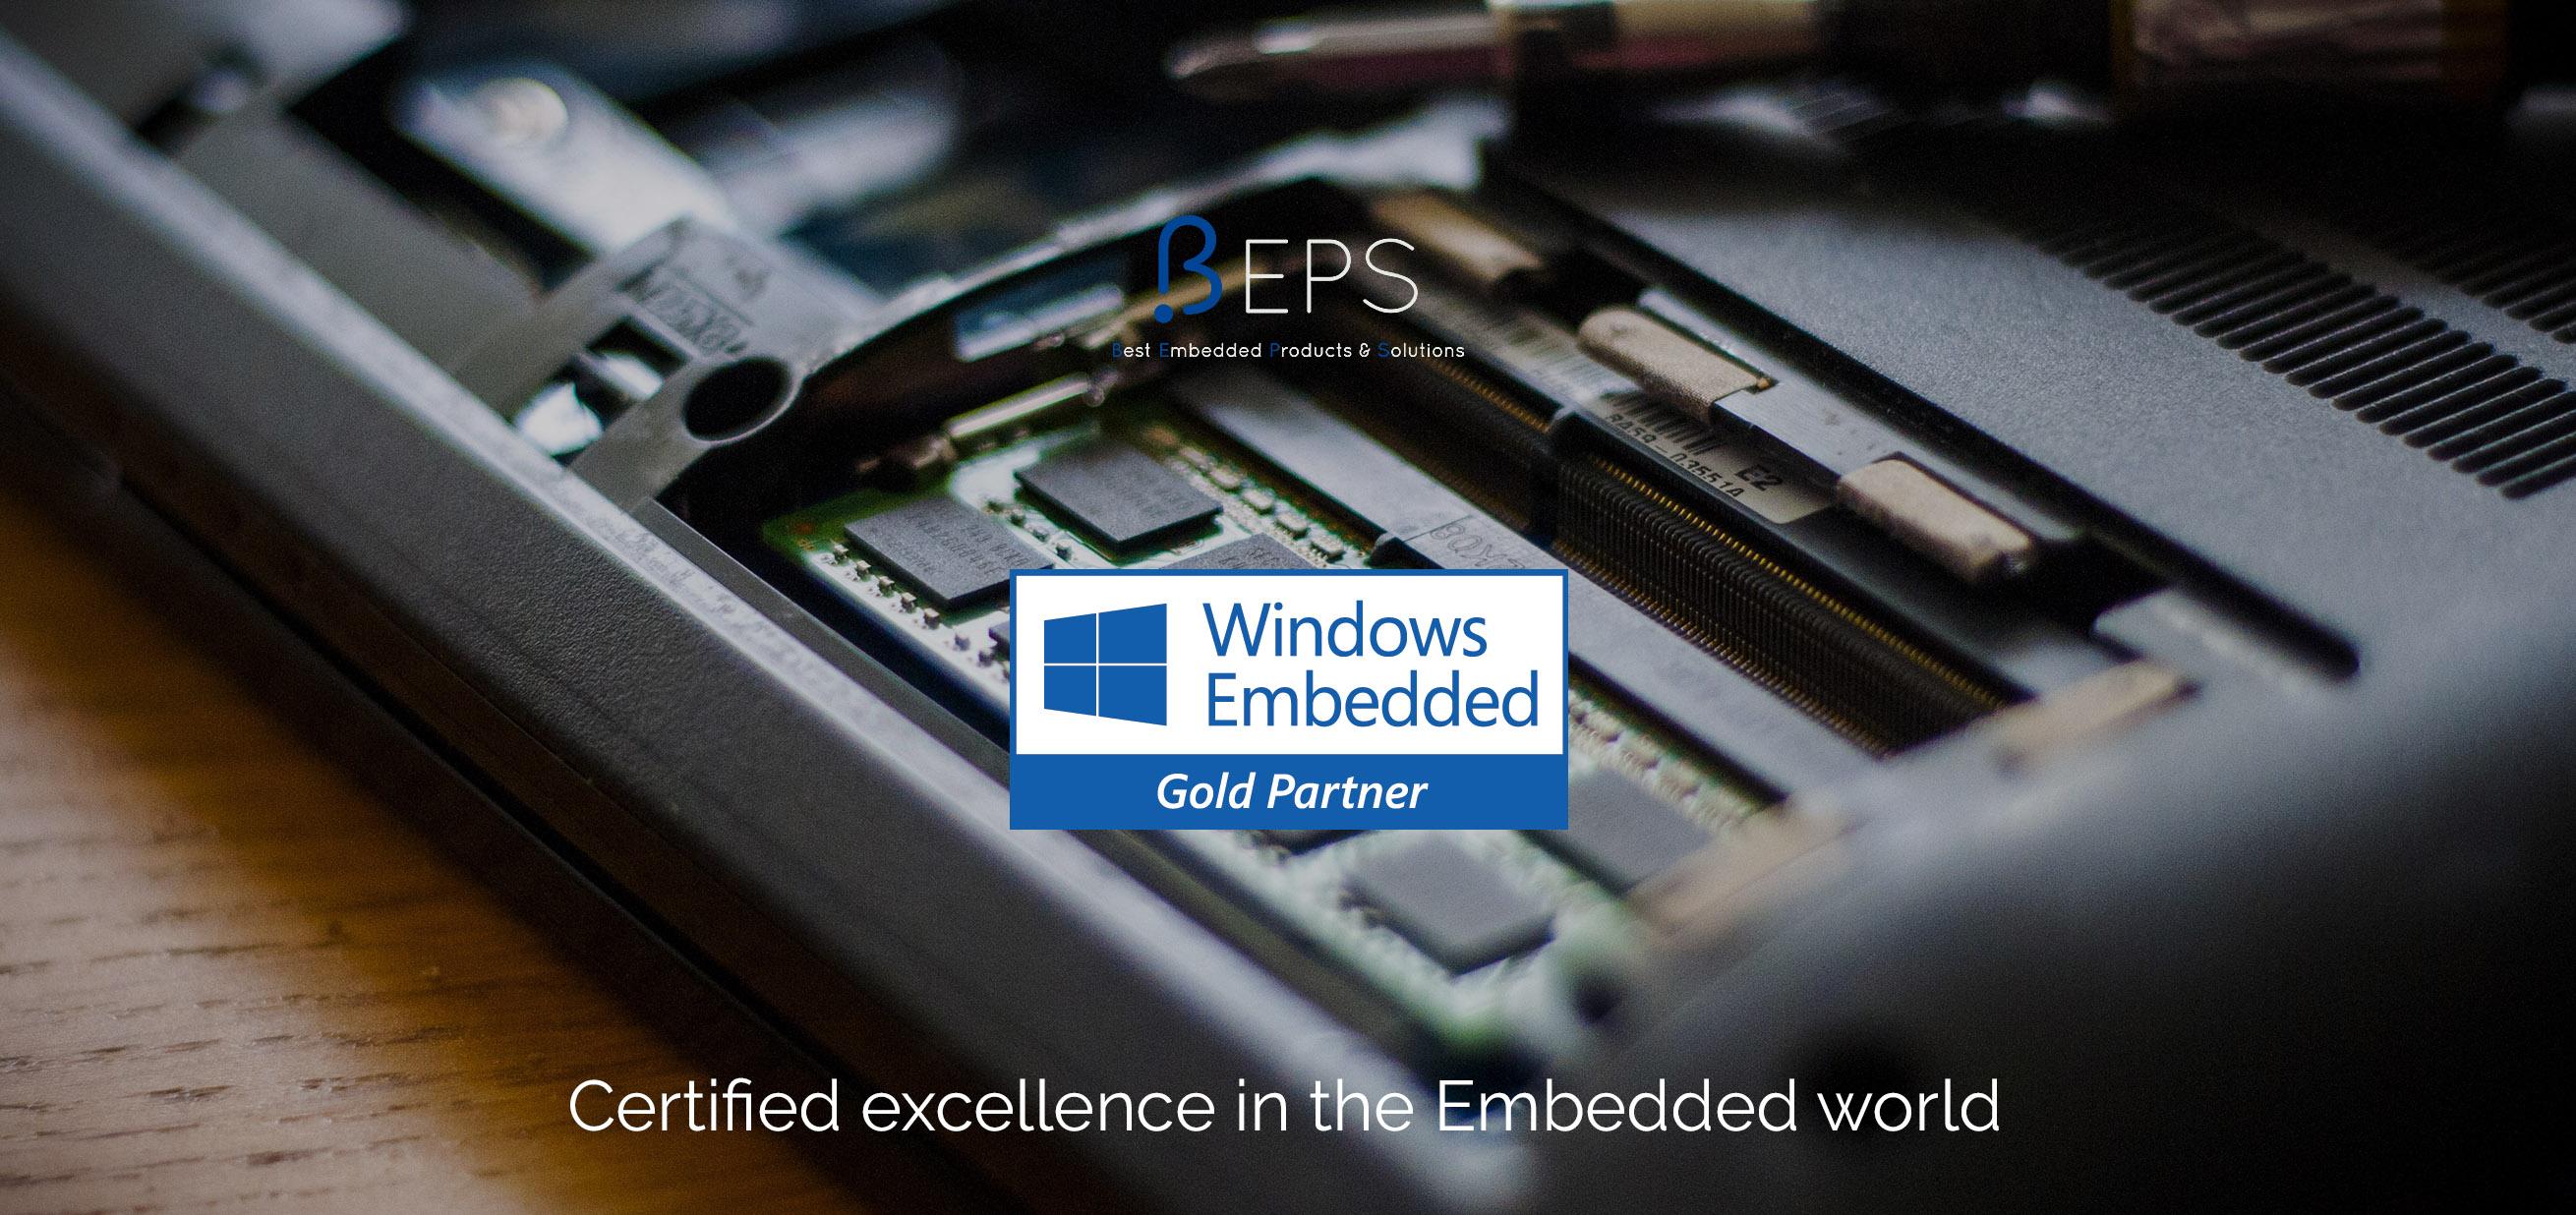 Beps Microsoft Embedded Gold Partner